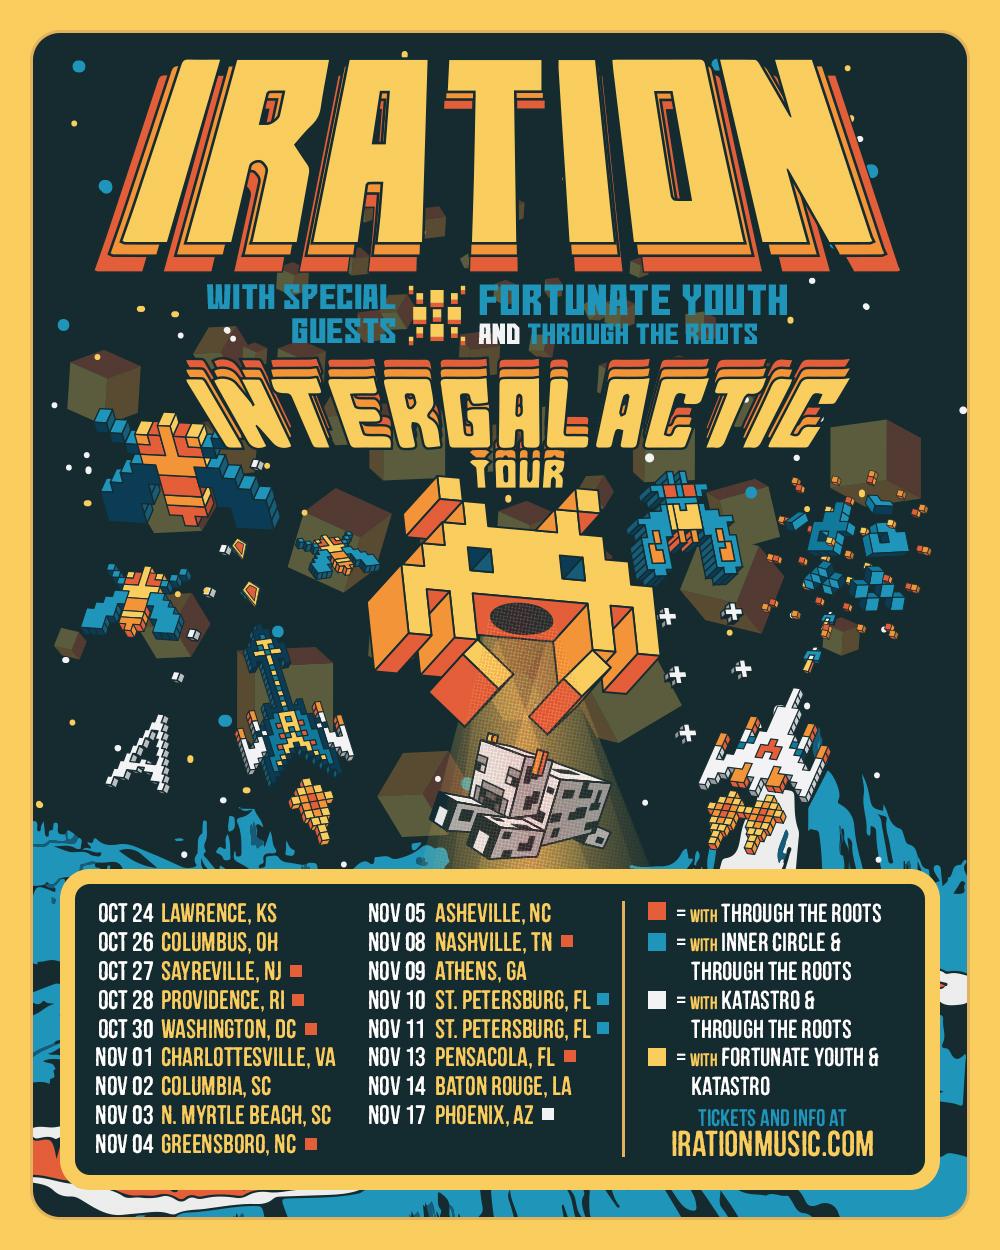 iration_intergalactic_tour_2017